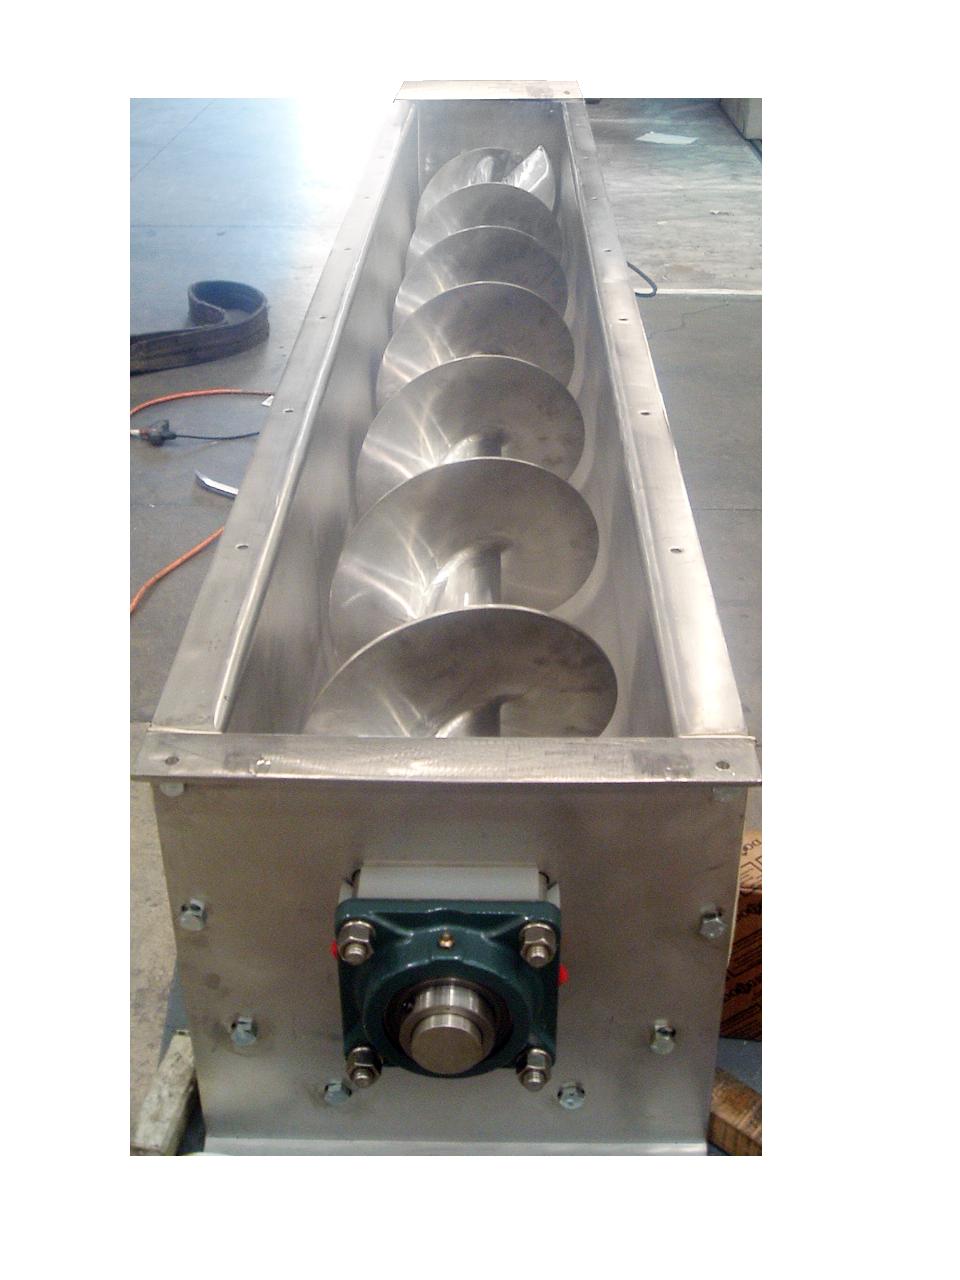 Stainless Steel screw feeder by Thomas Conveyor Compnay